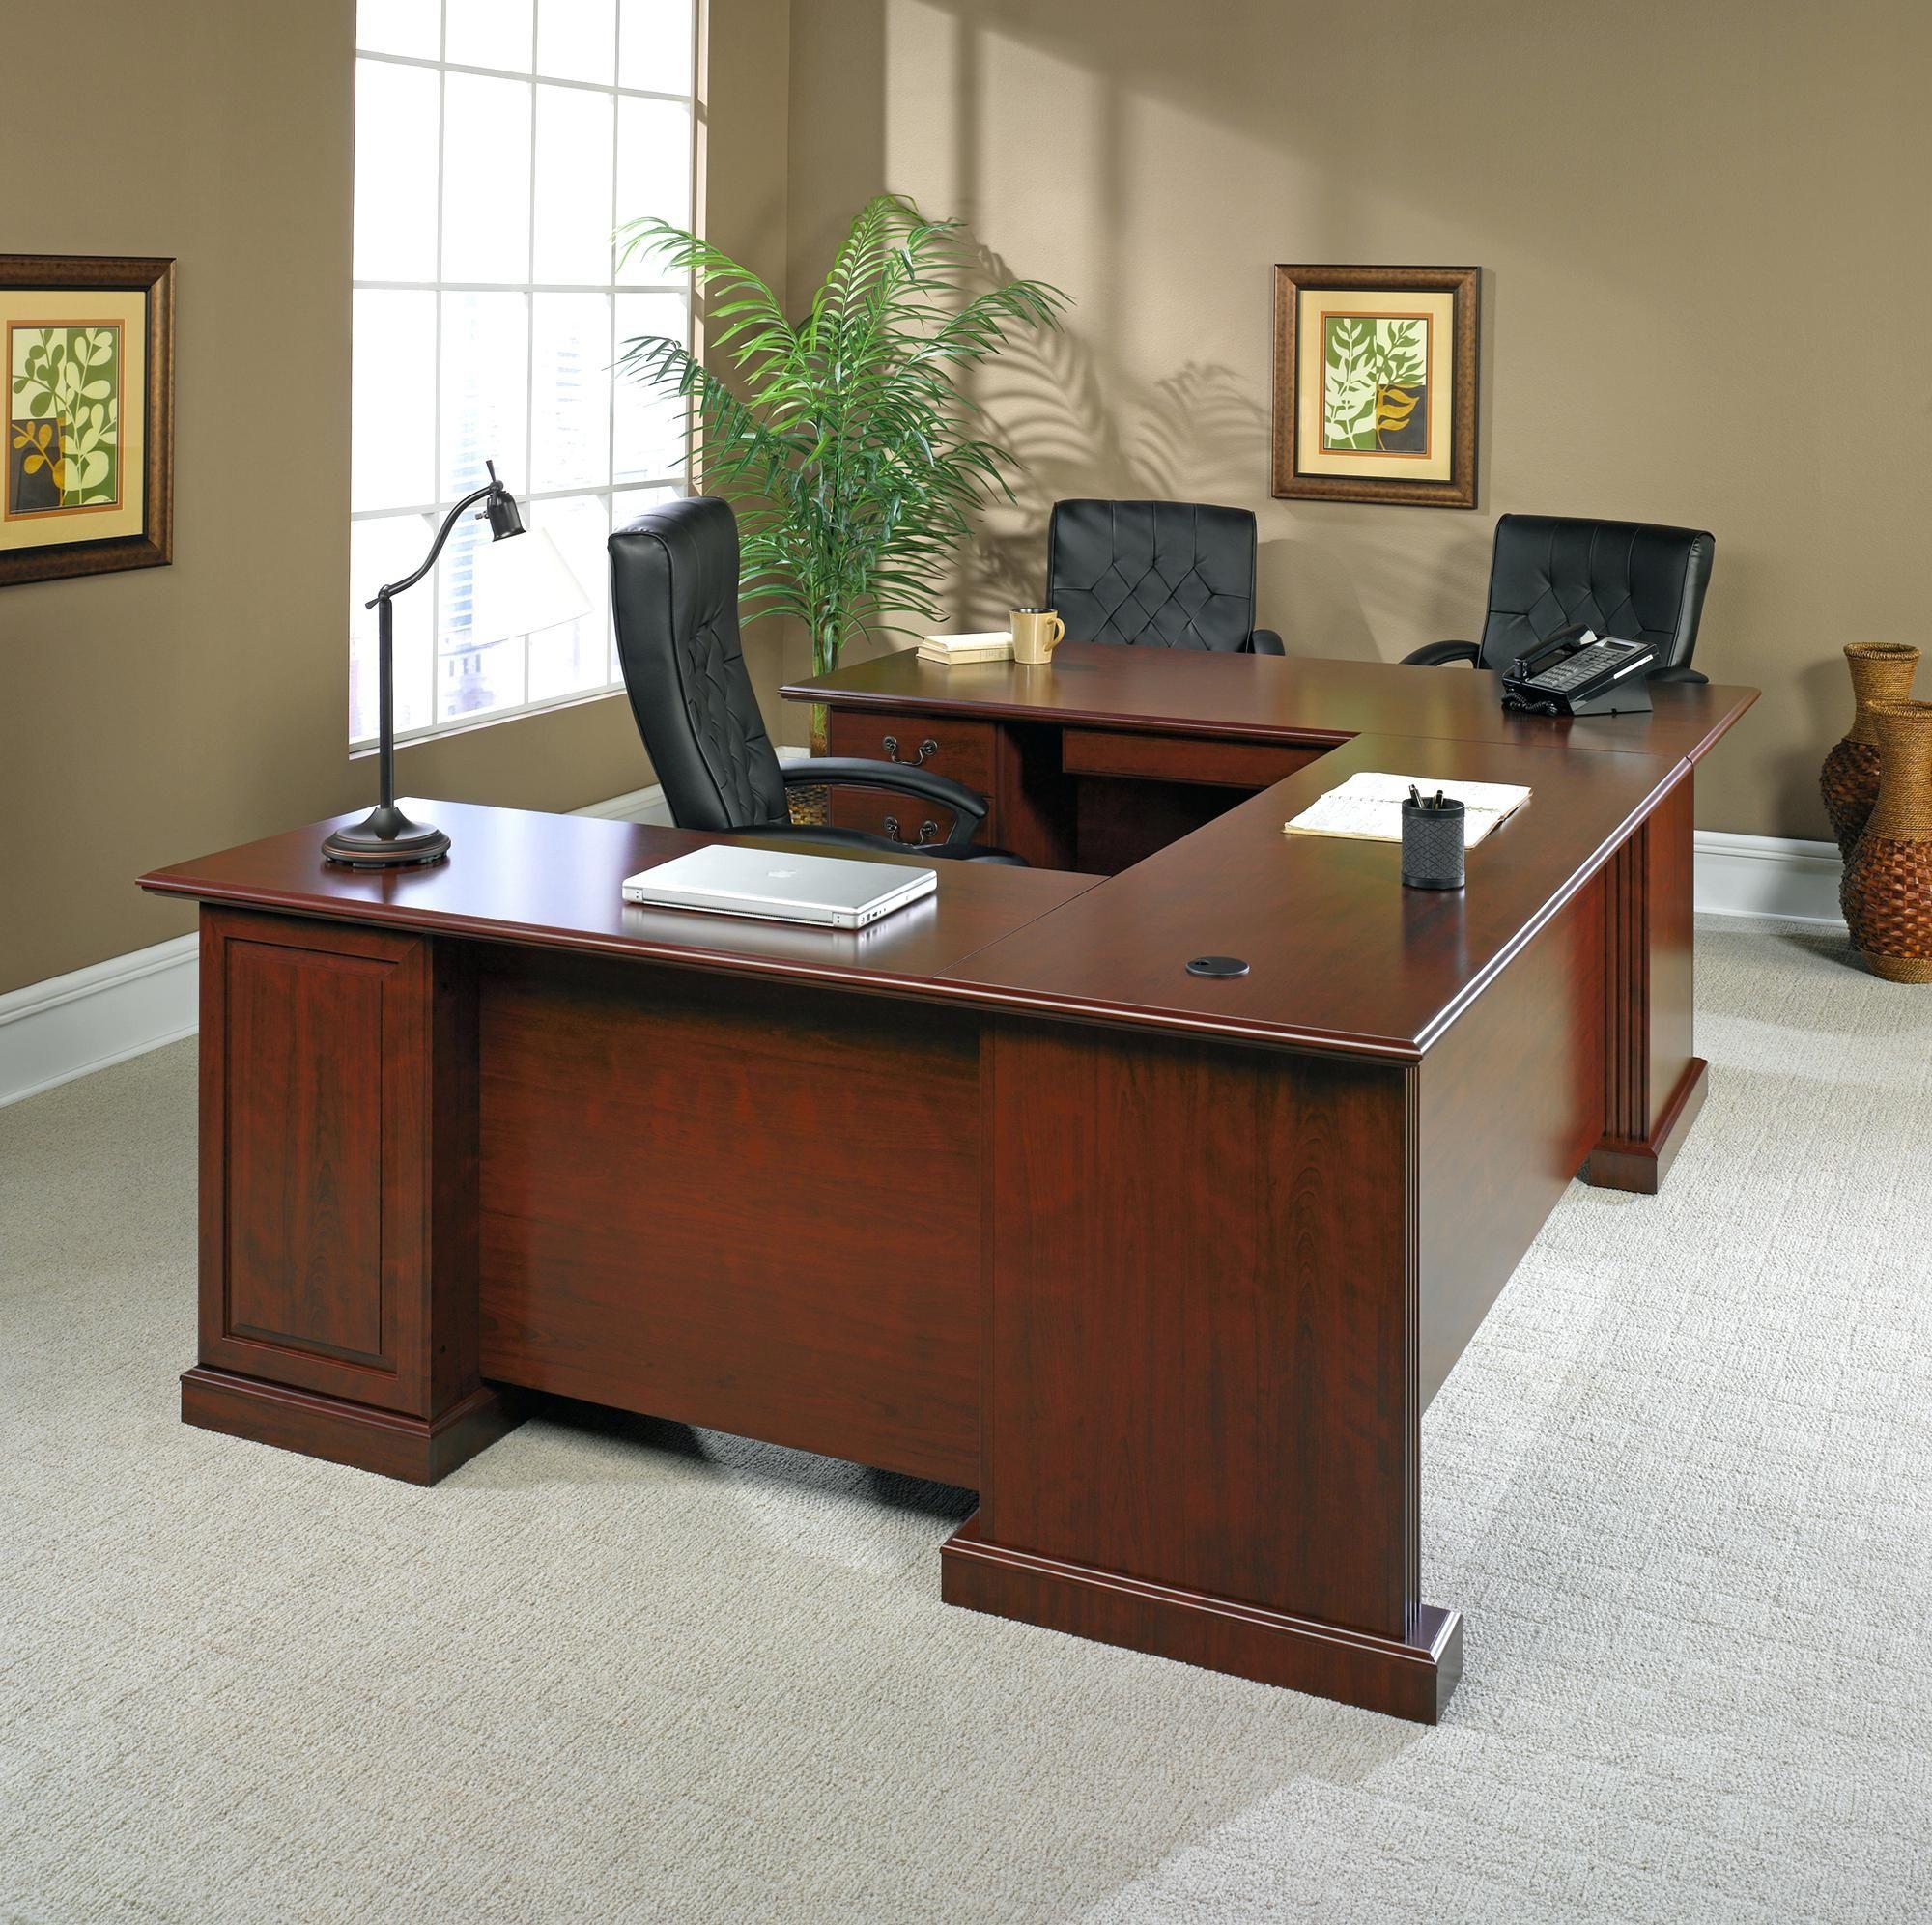 office saving desk glass depot computer shaped space bright u ideas e